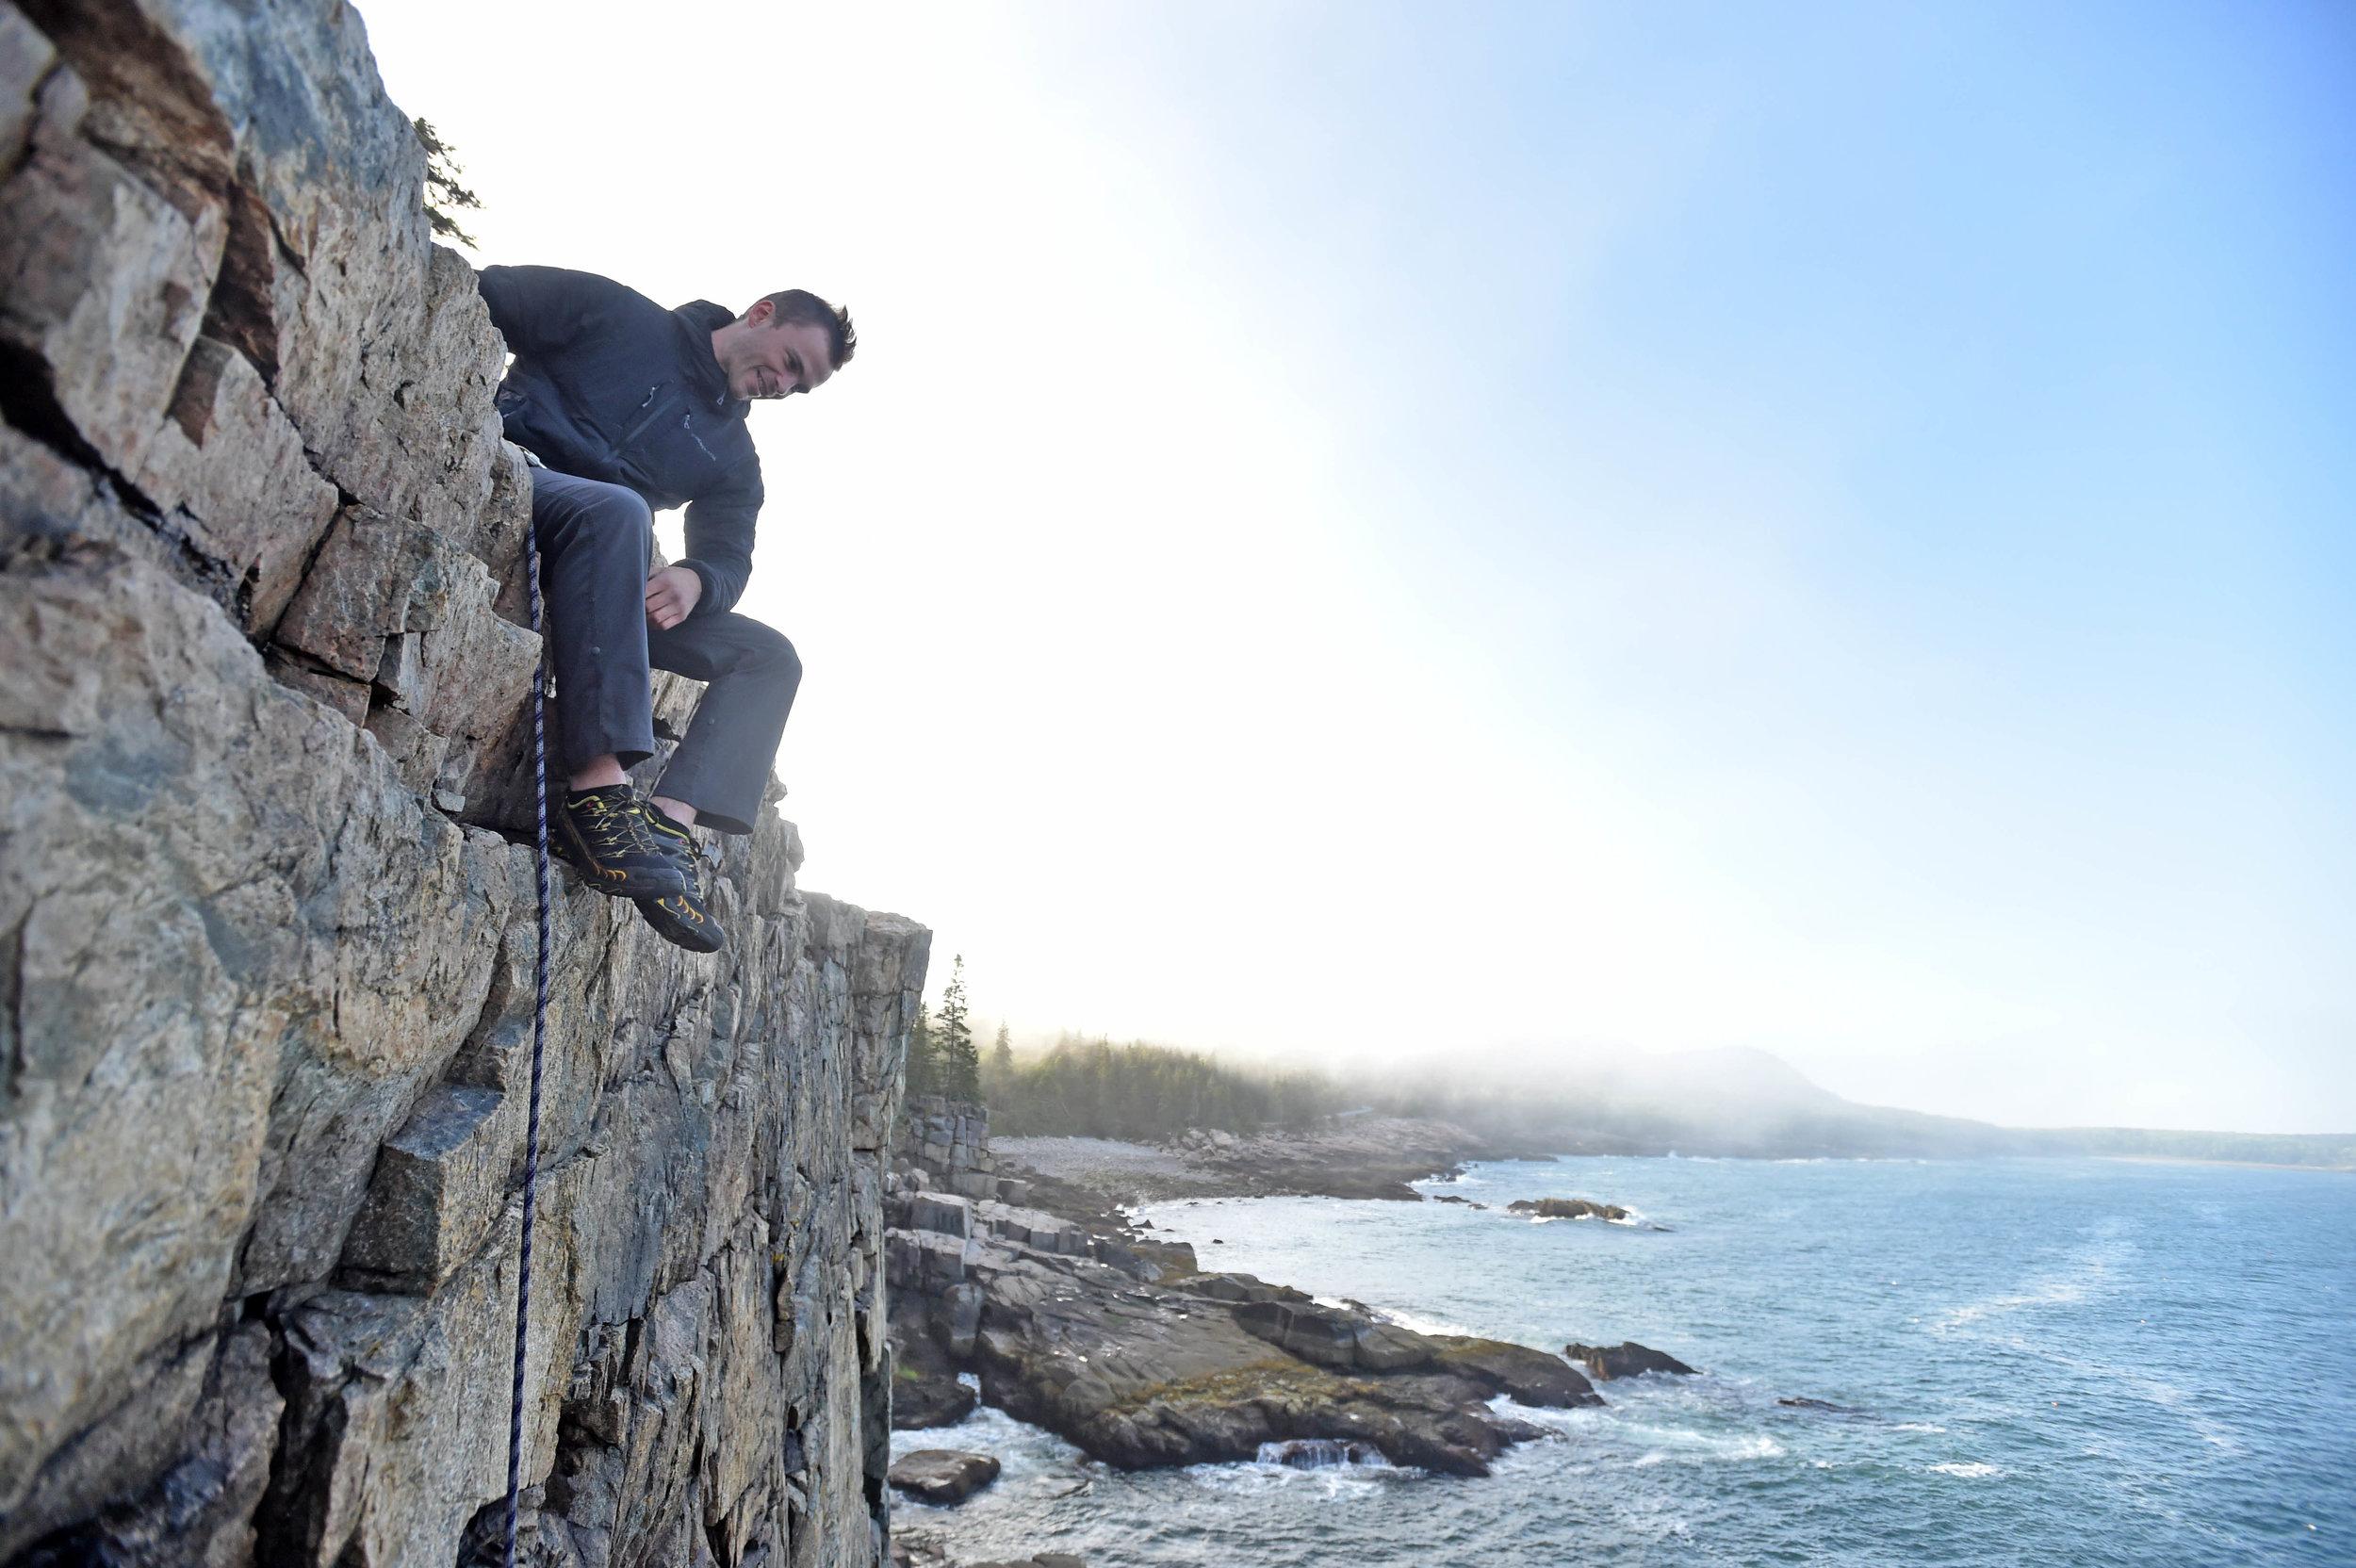 Ryan Howes belays his guest while enjoying coastal Maine's splendid summer environment.  Photo by Michael G. Seamans